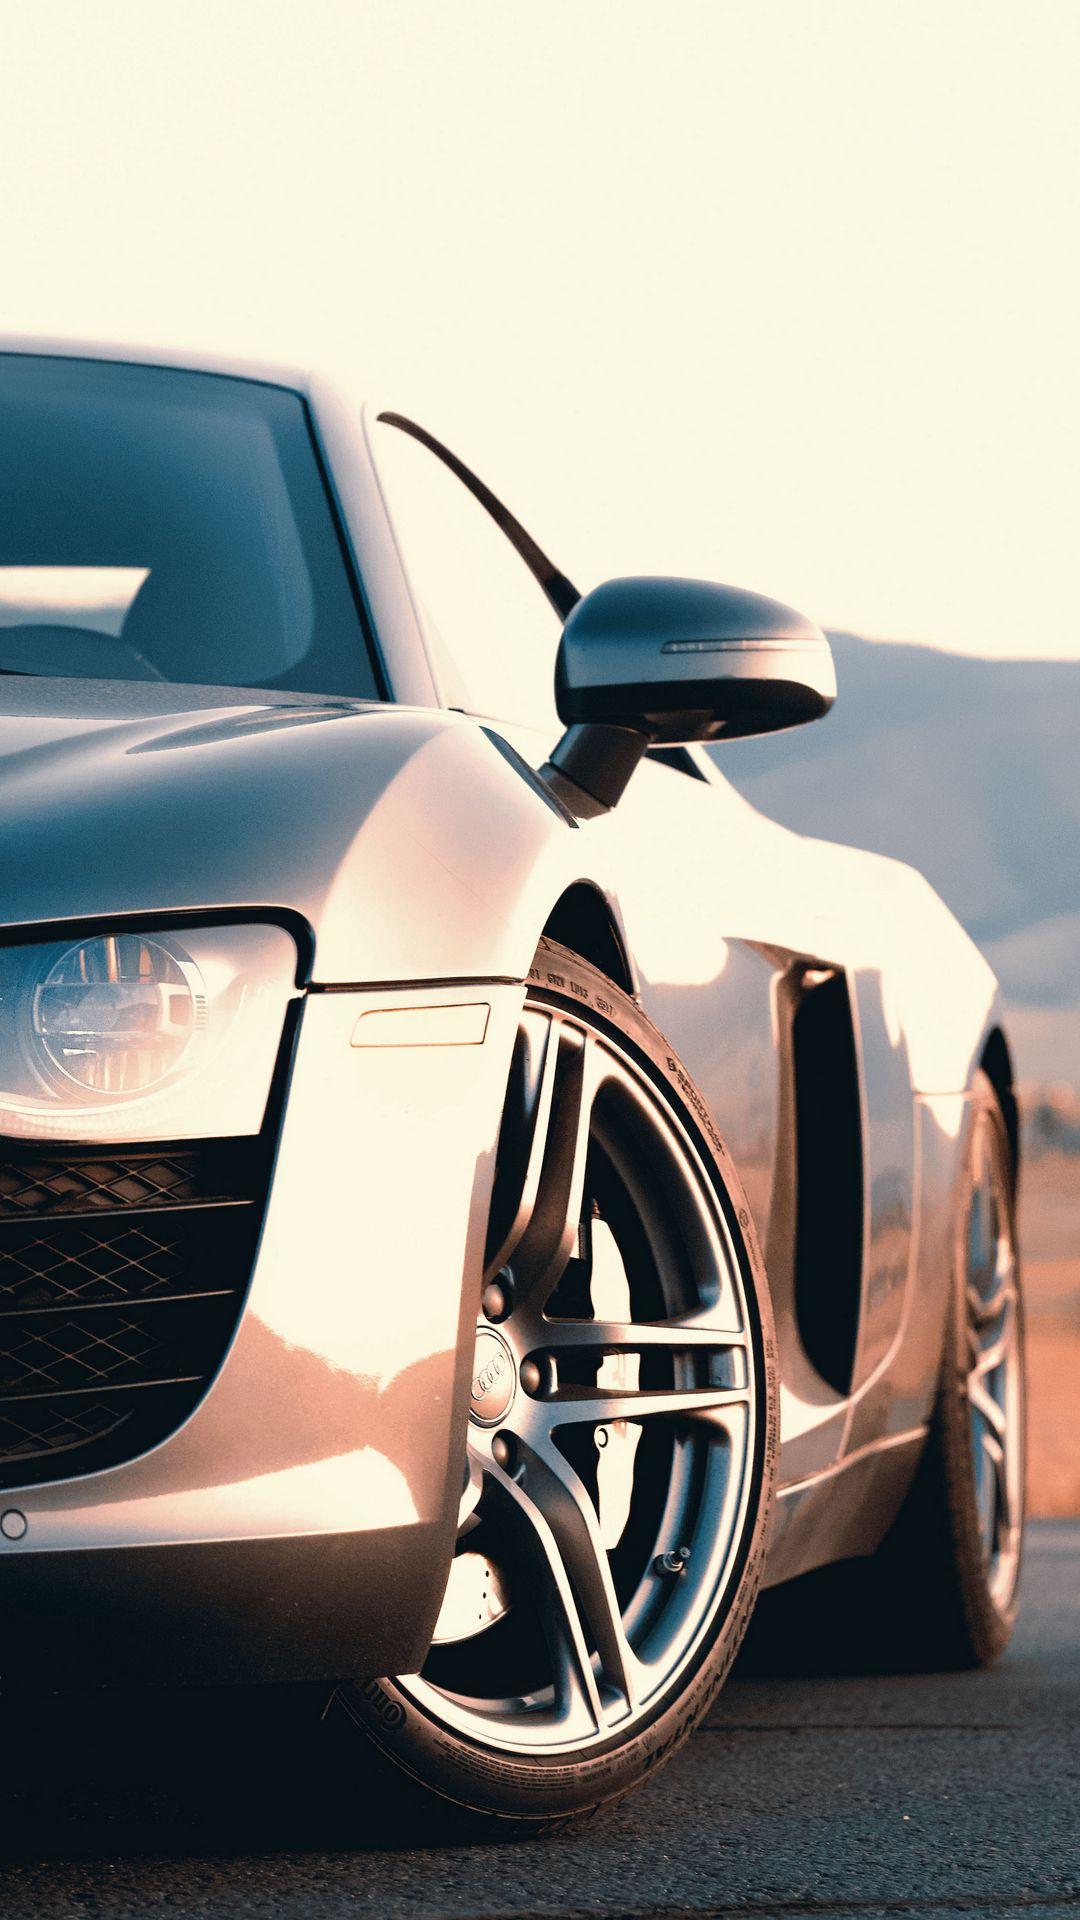 Audi R8 Sport Car HD Wallpapers Free Download